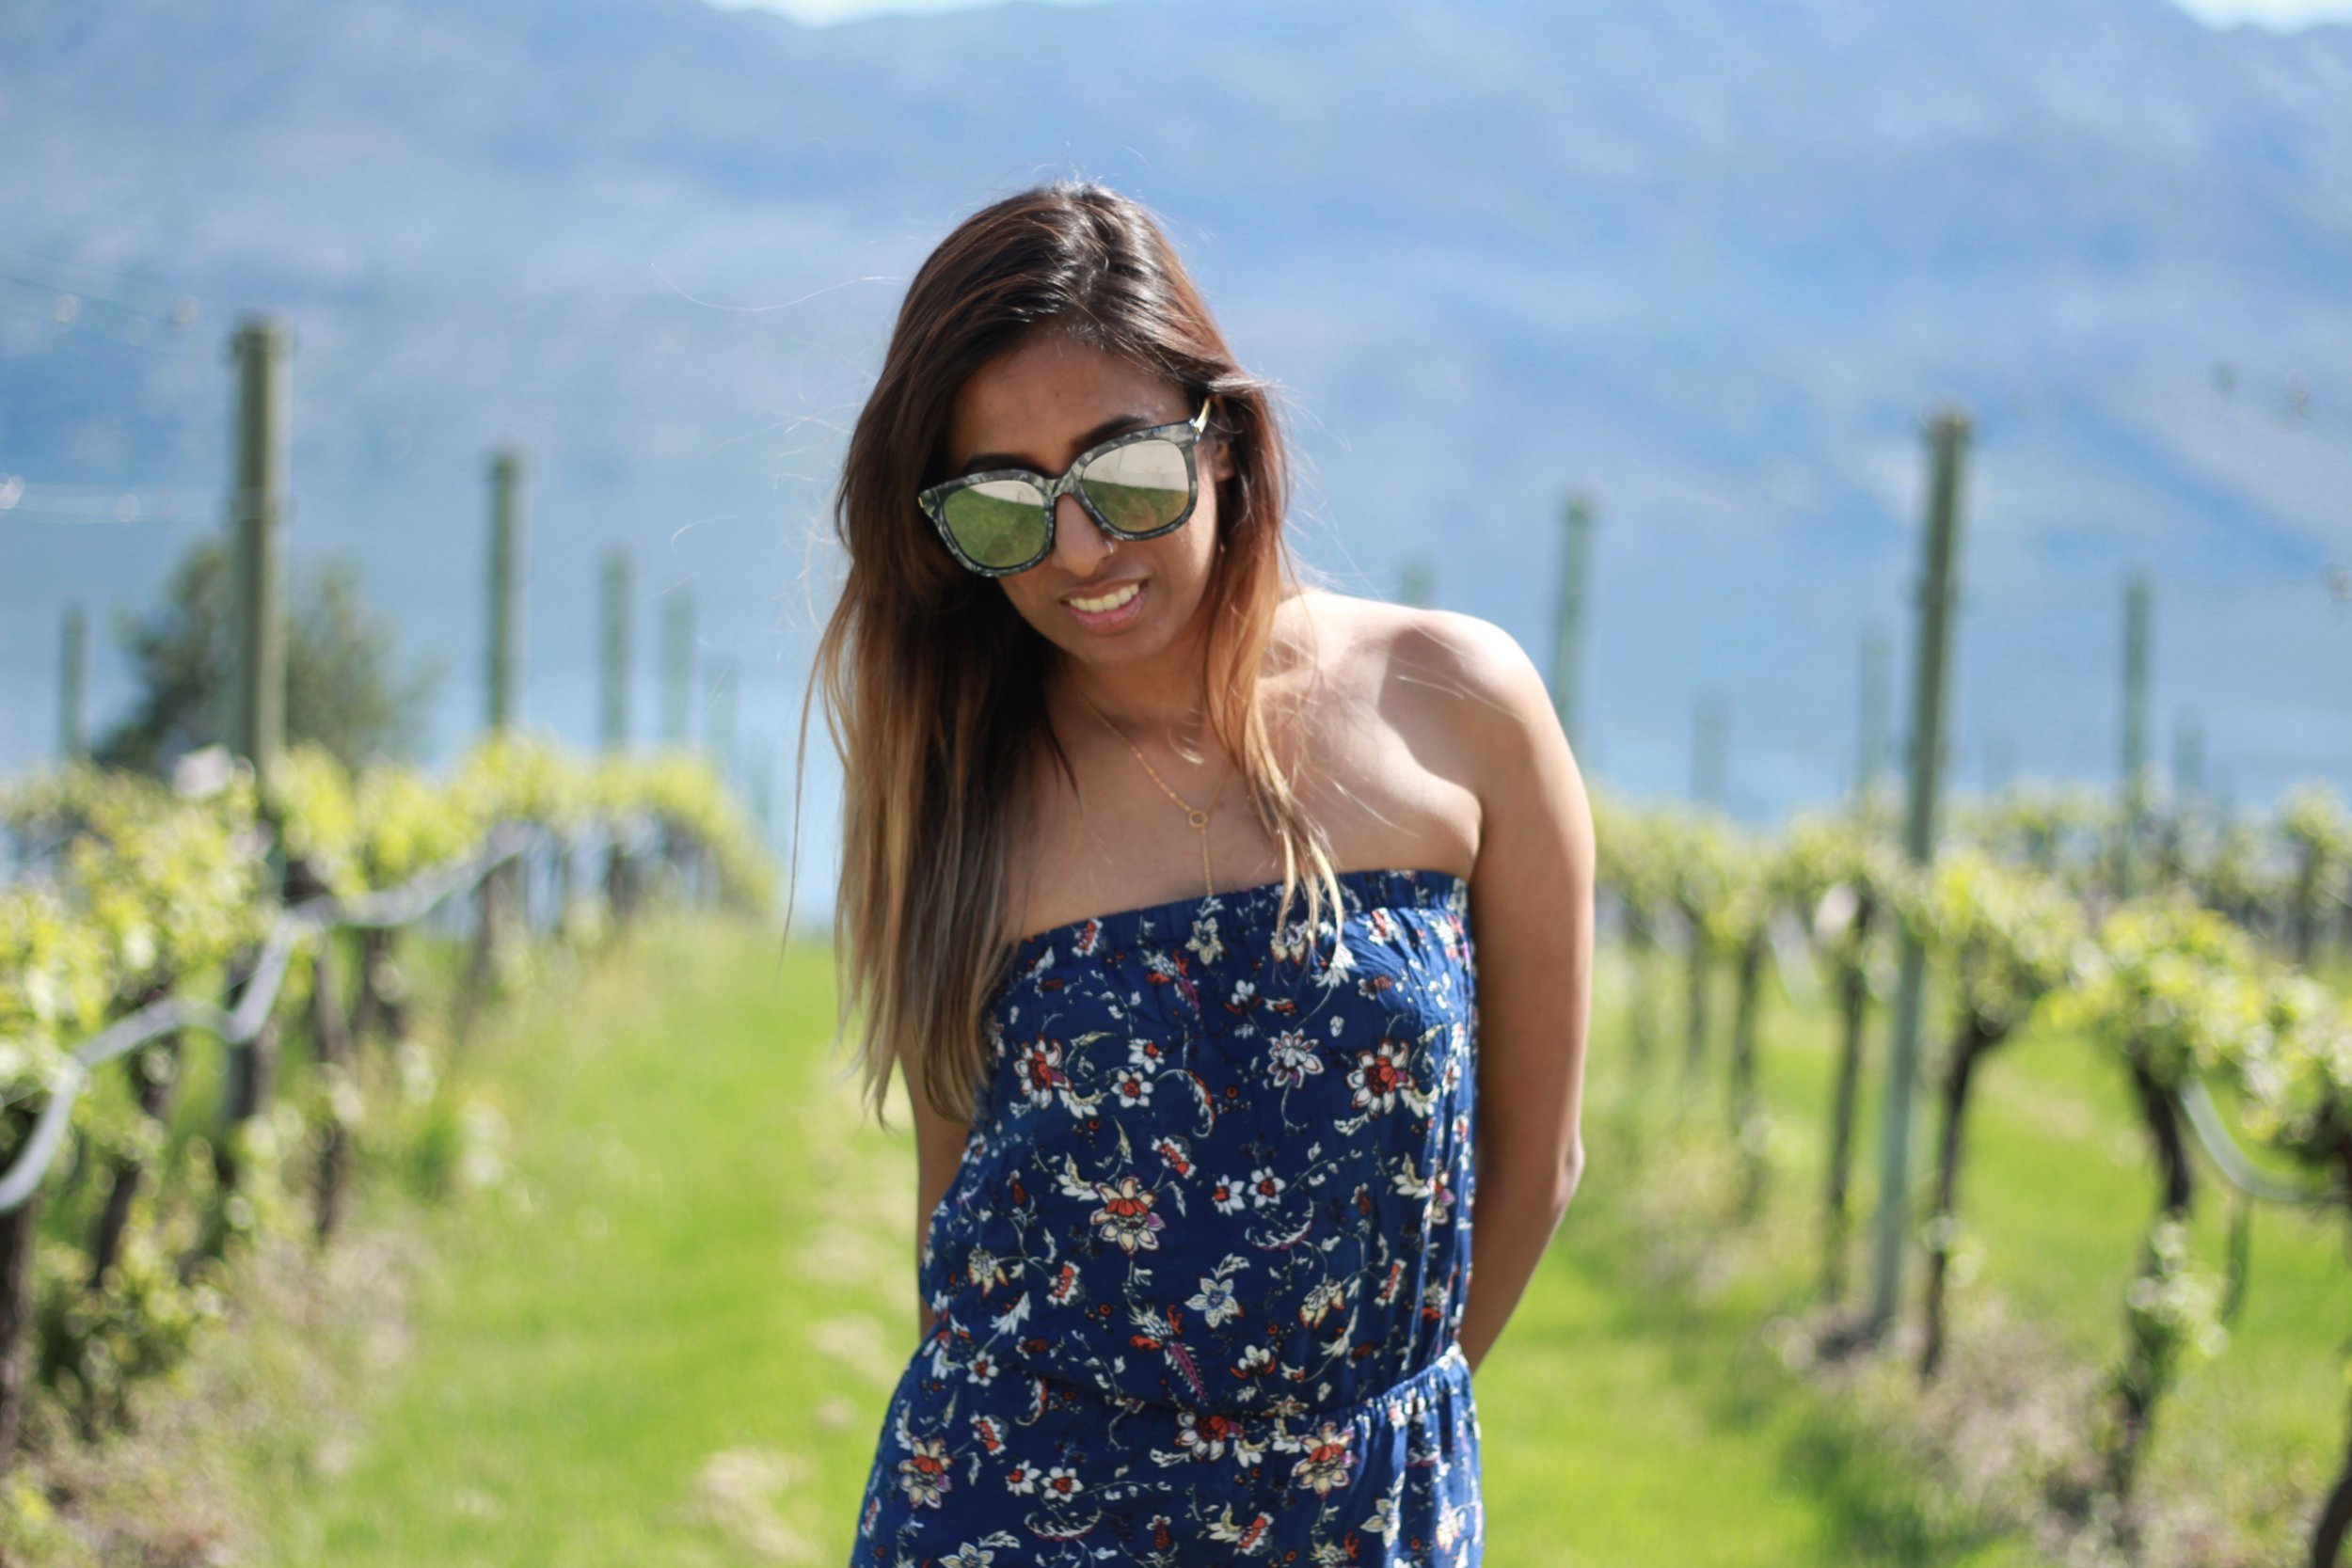 Mission Hill vineyard